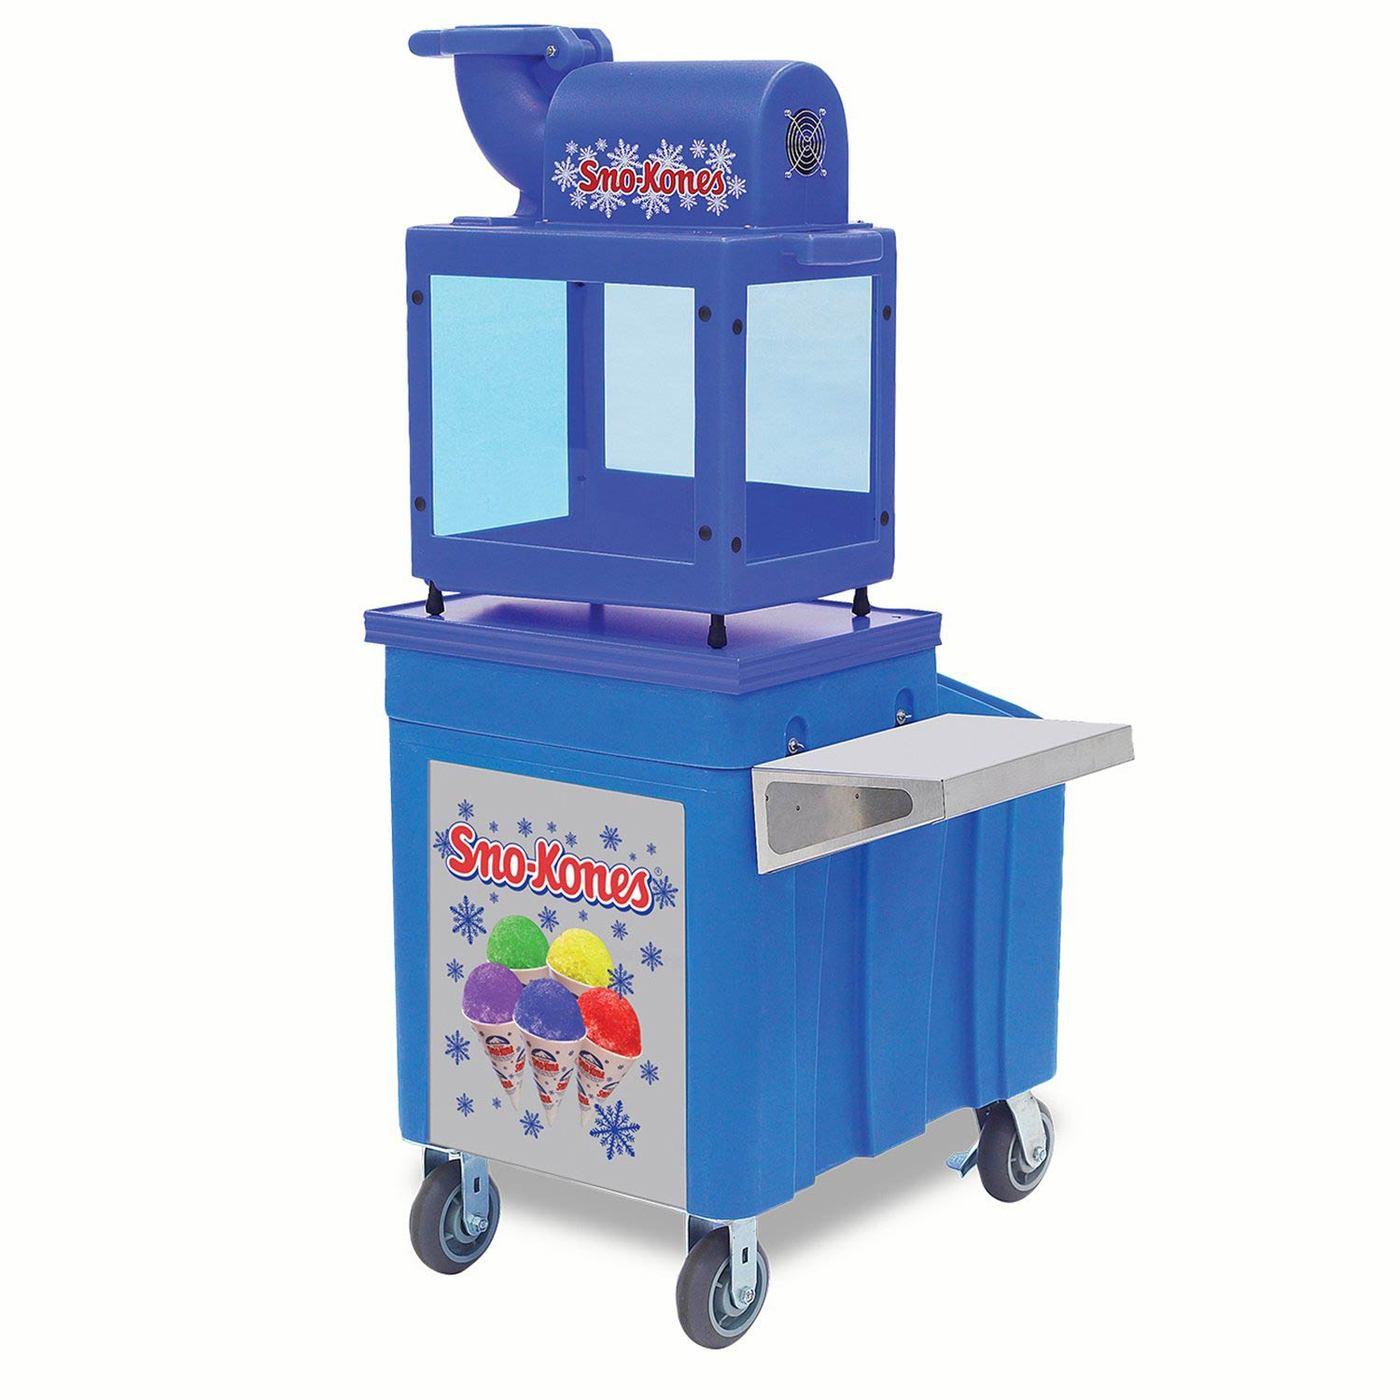 Sno-Kone Cart (Customer Provides Ice)